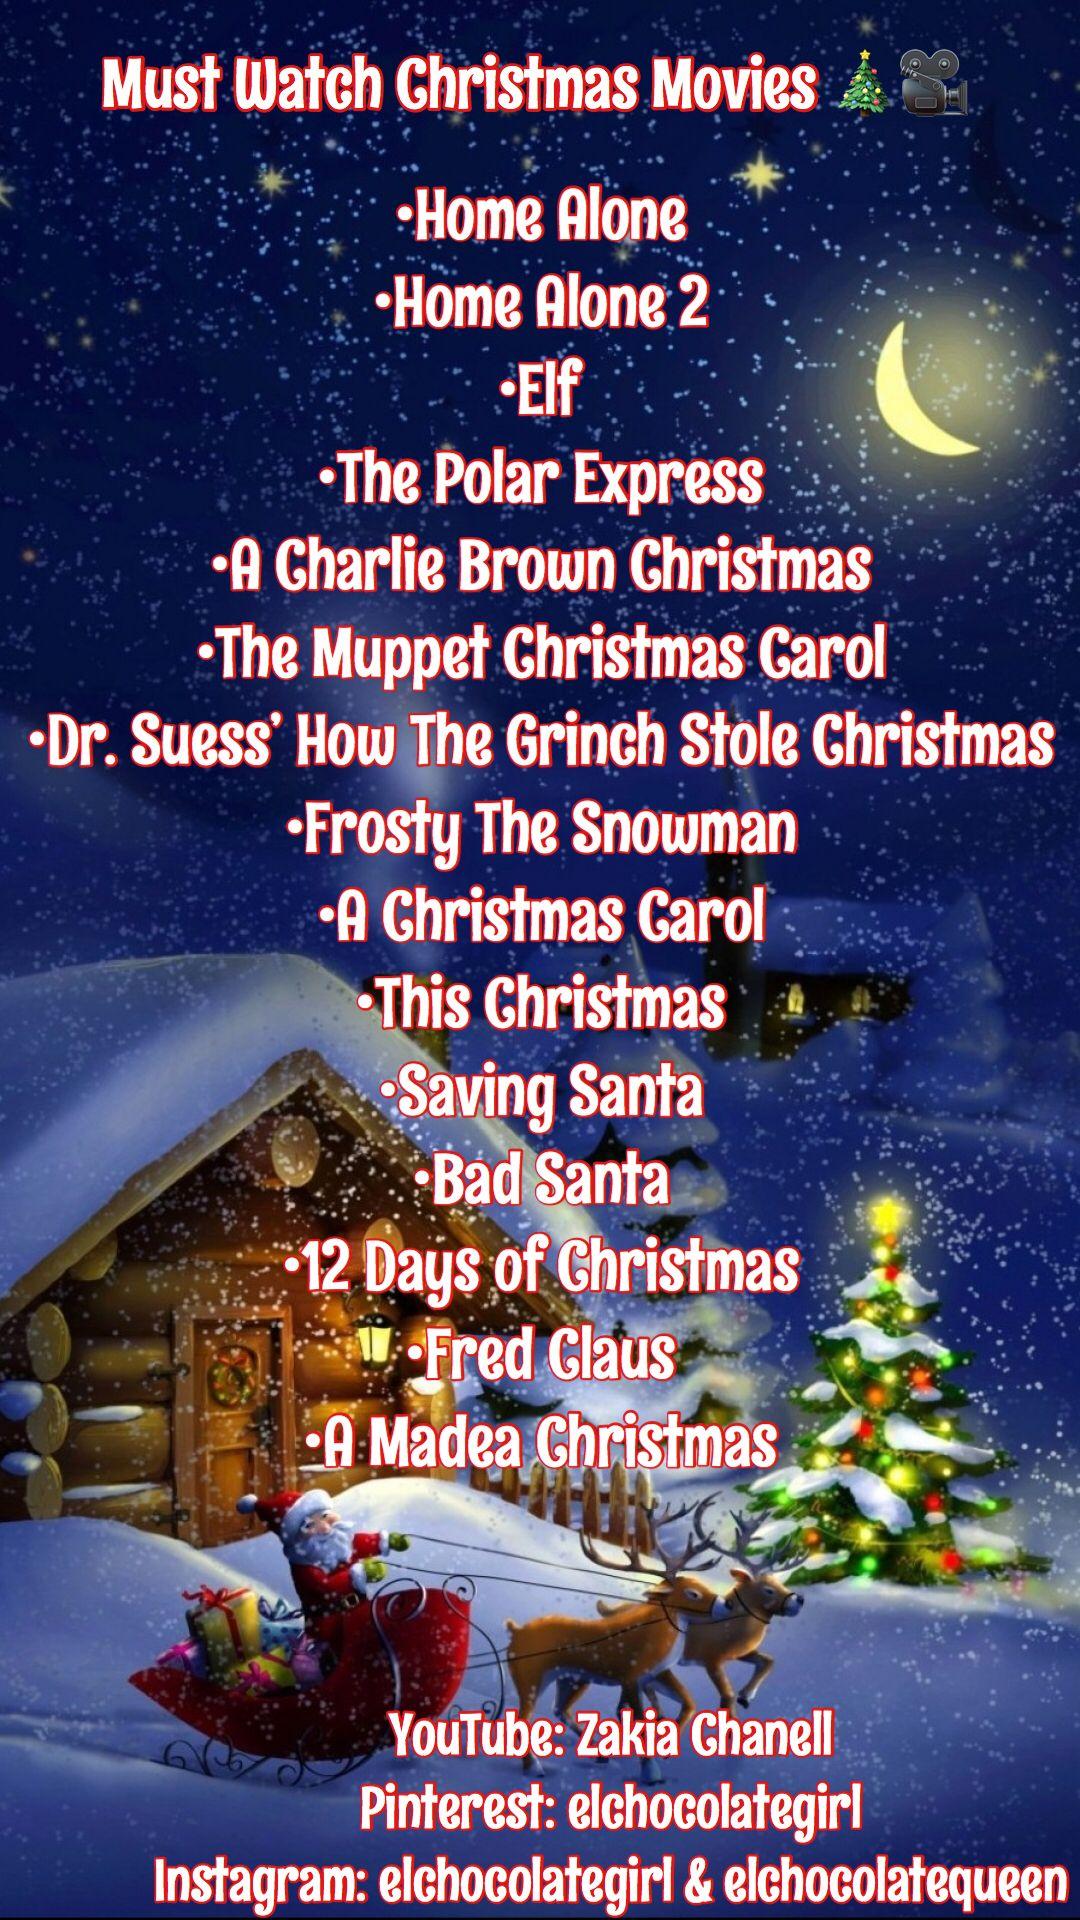 Pin by Mari Johnson Spradley on Christmas Ideas & Goodies ...